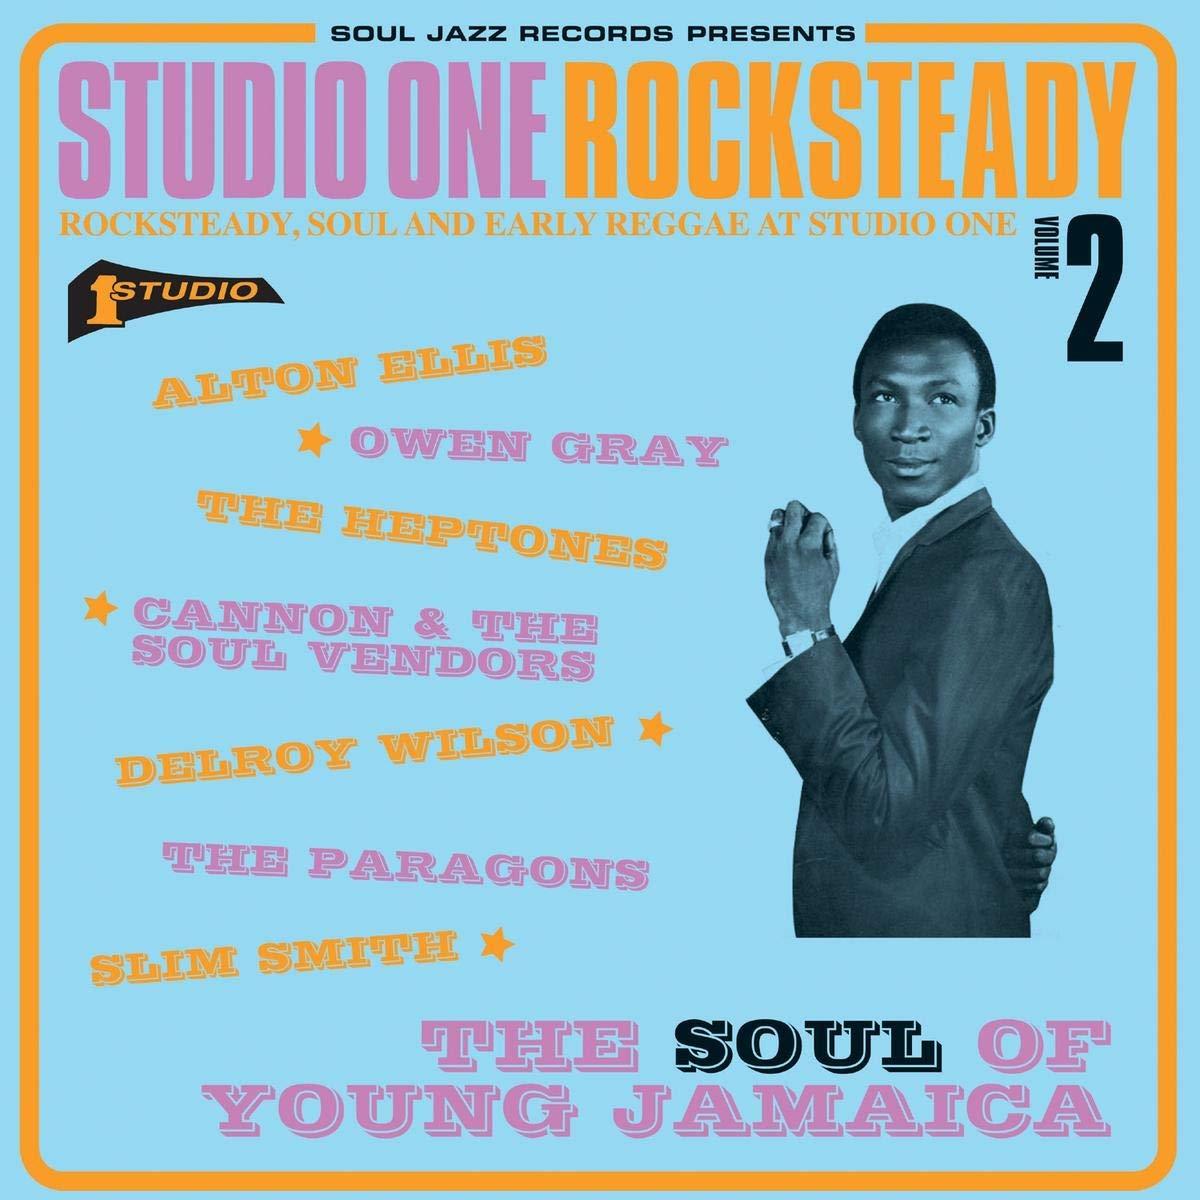 Rocksteady, Soul And Early Reggae At Studio One : Varios: Amazon.es: Música